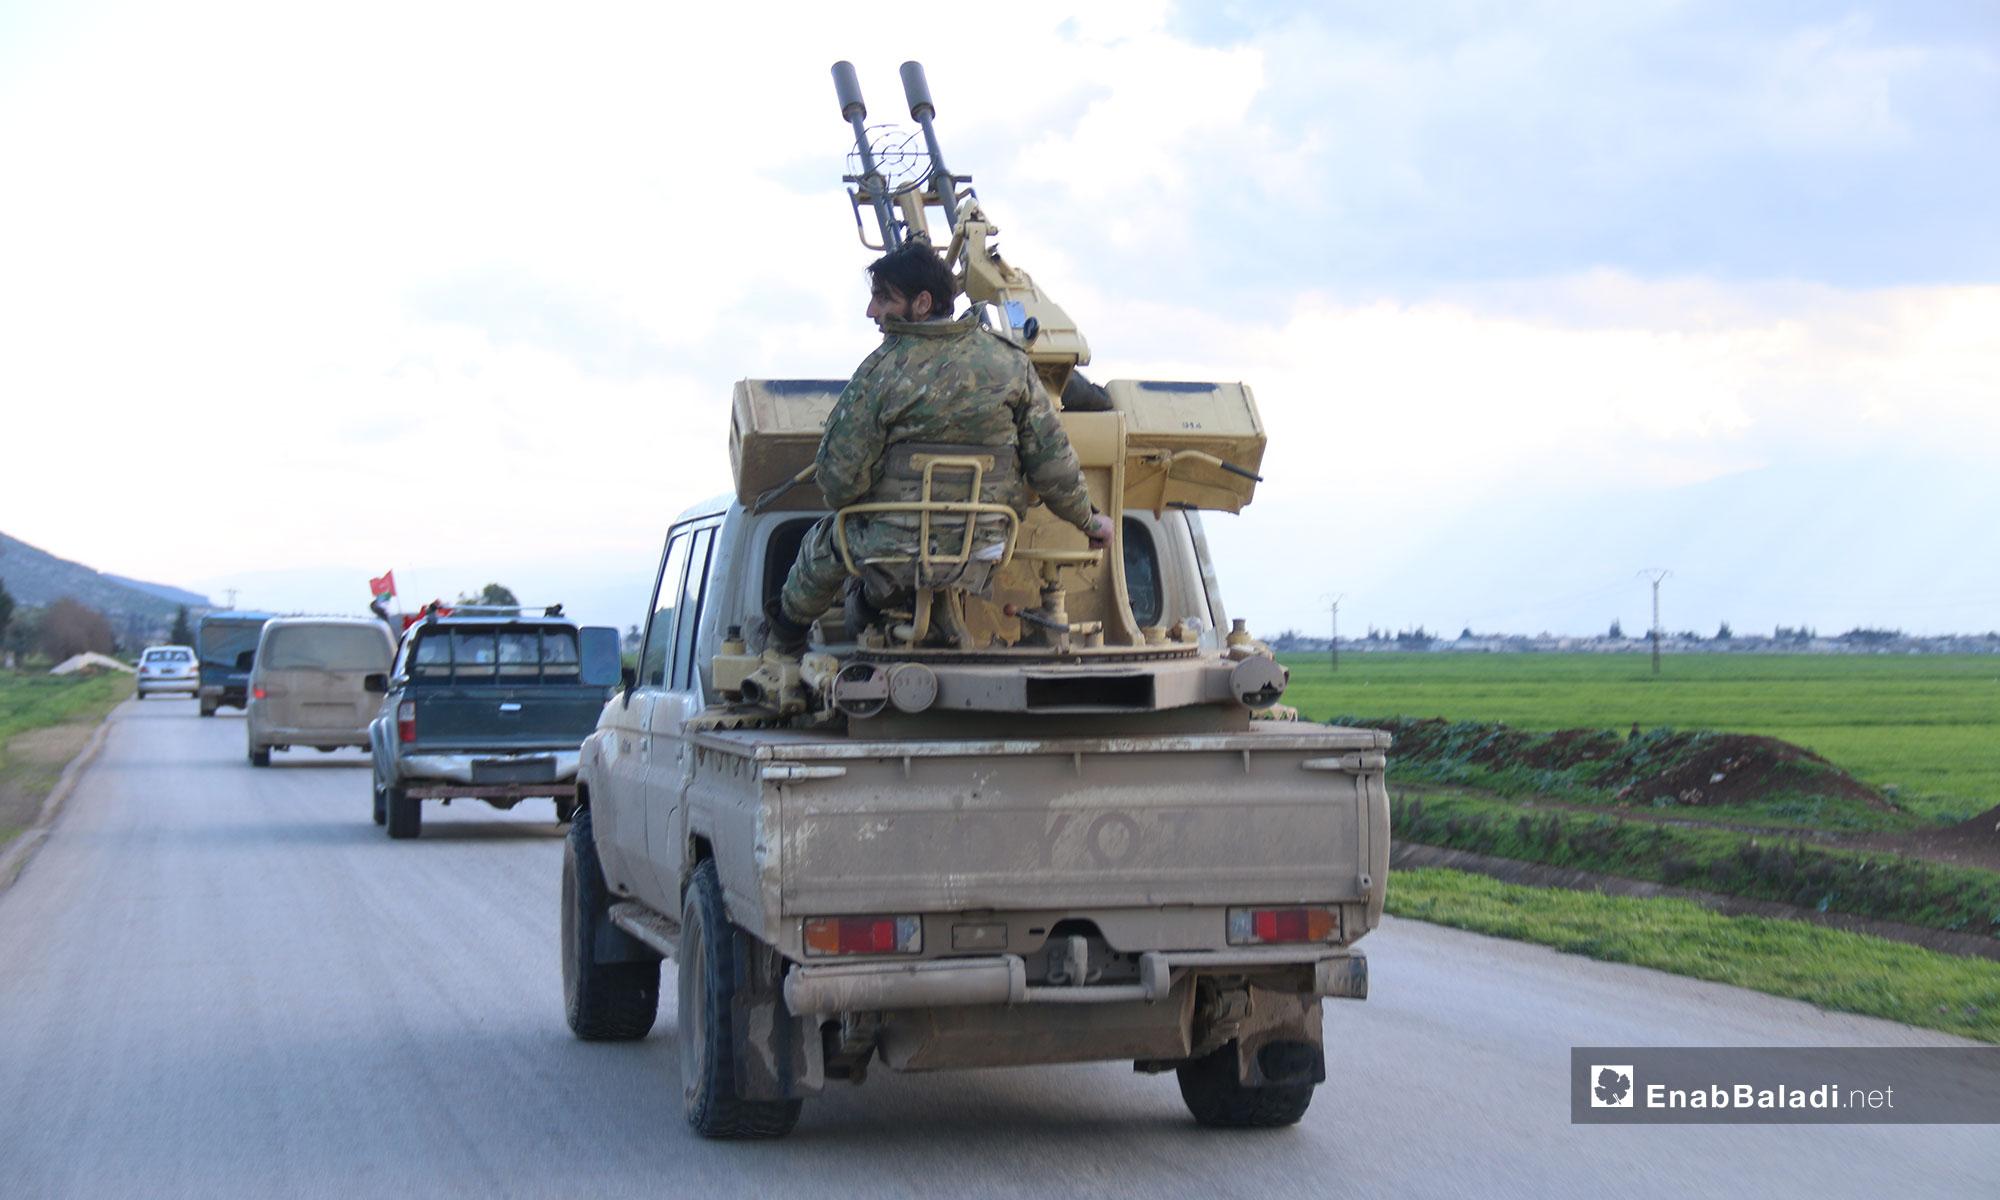 Turkish Army Patrol enters the demilitarized zone in rural Hama – March 18, 2019 (Enab Baladi)